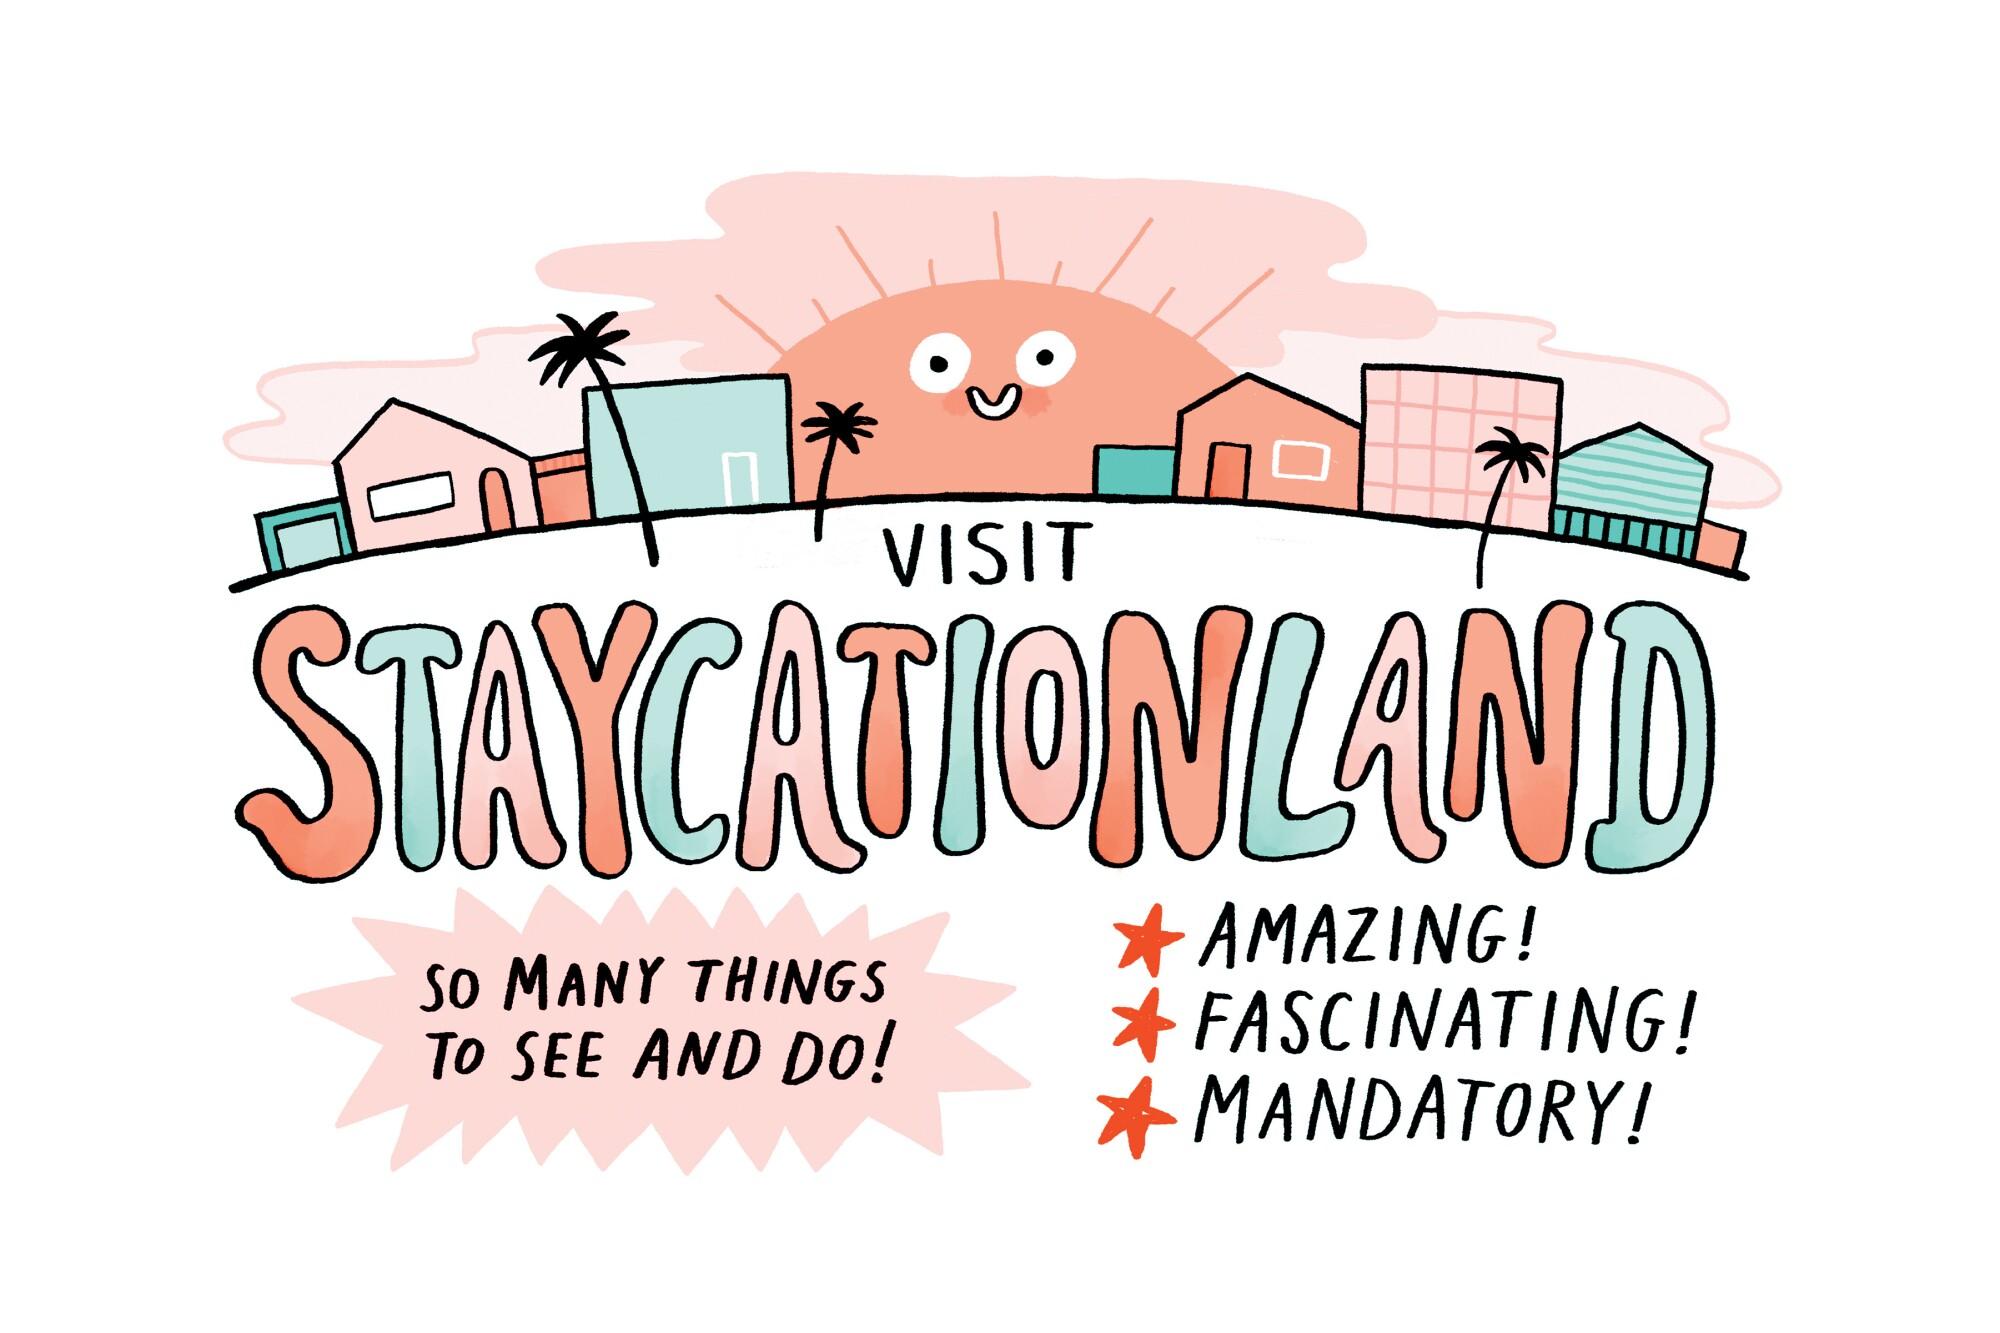 Visit Staycationland